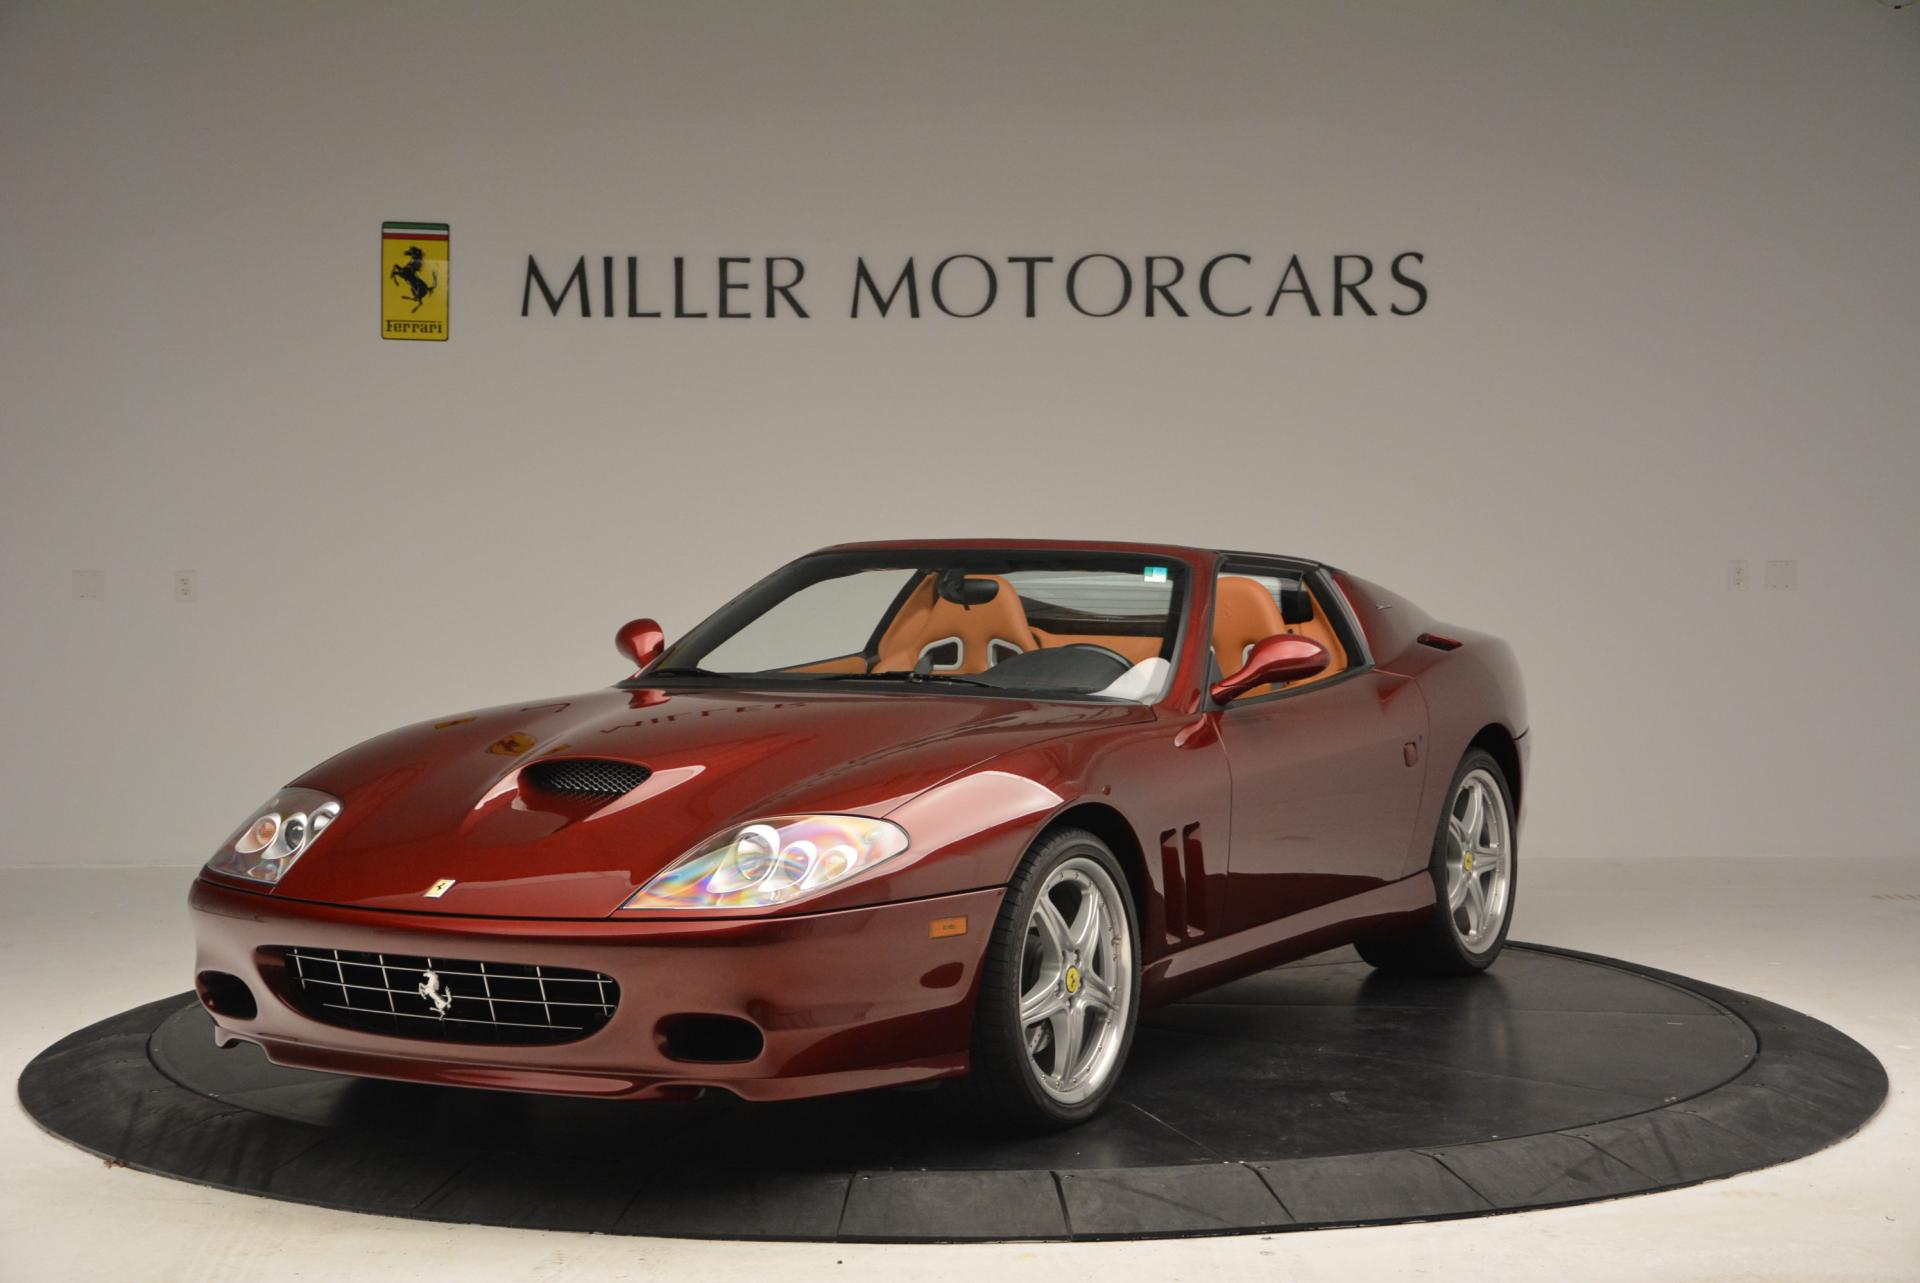 Used 2005 Ferrari Superamerica for sale Sold at Rolls-Royce Motor Cars Greenwich in Greenwich CT 06830 1